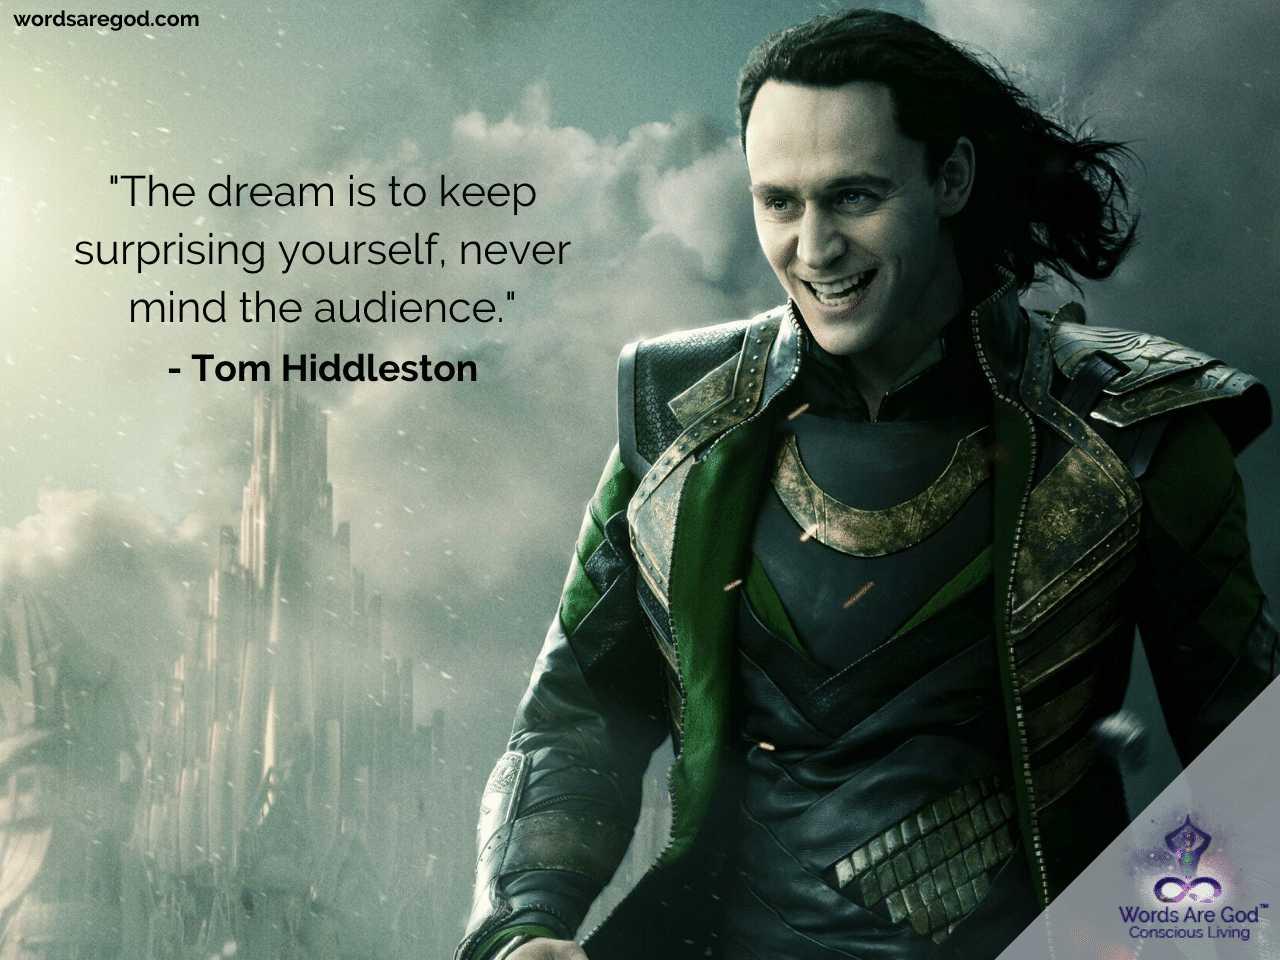 Tom Hiddleston Life Quotes by Tom Hiddleston